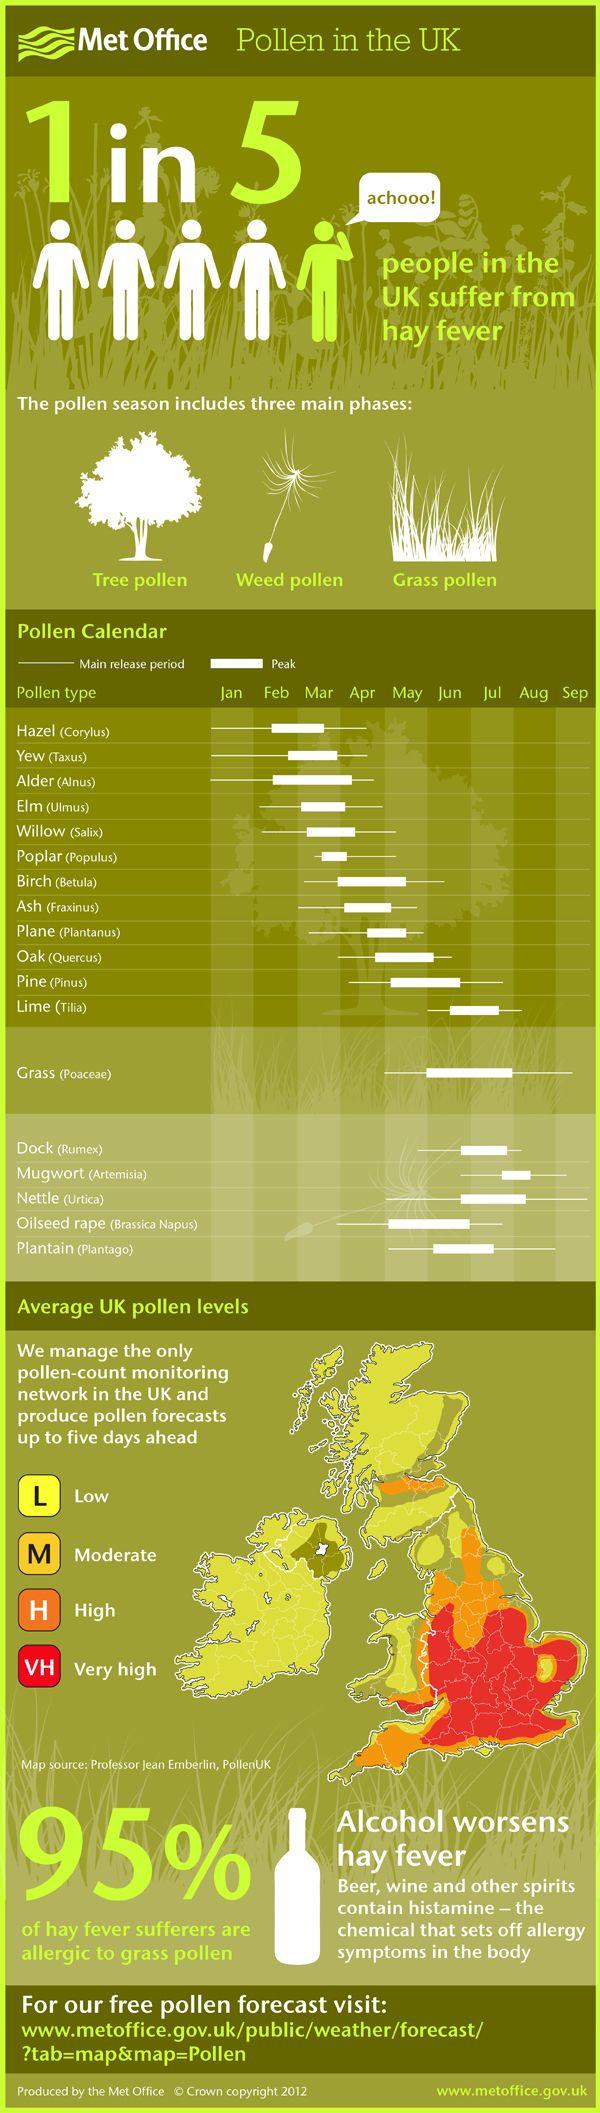 UK Pollen Calendar Infographic 2012